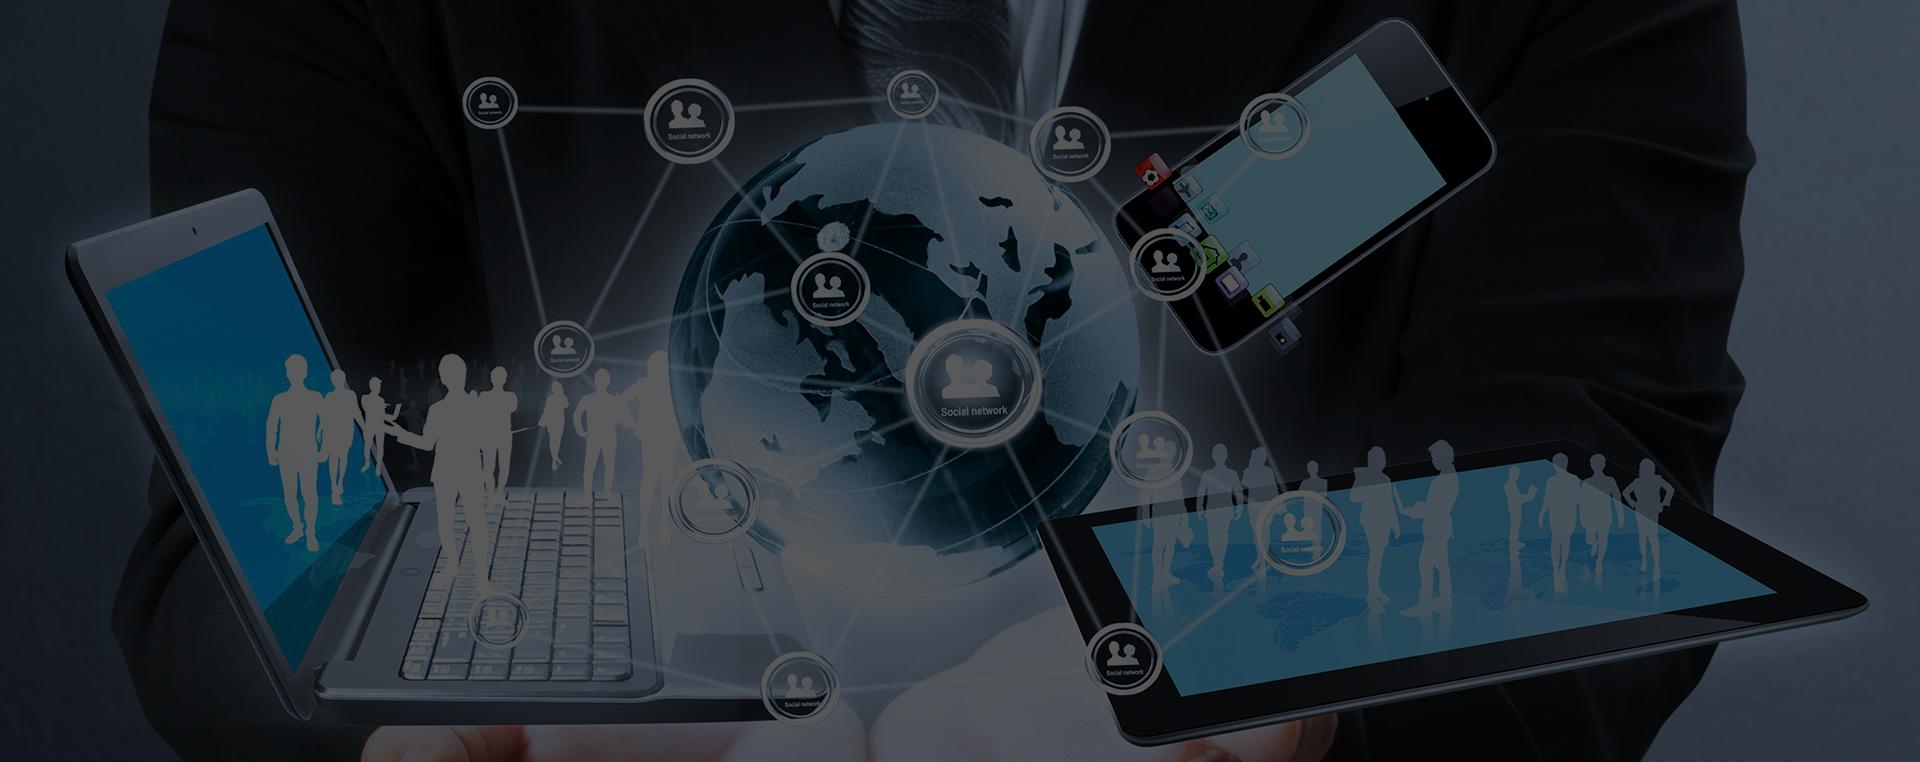 Asset Software System